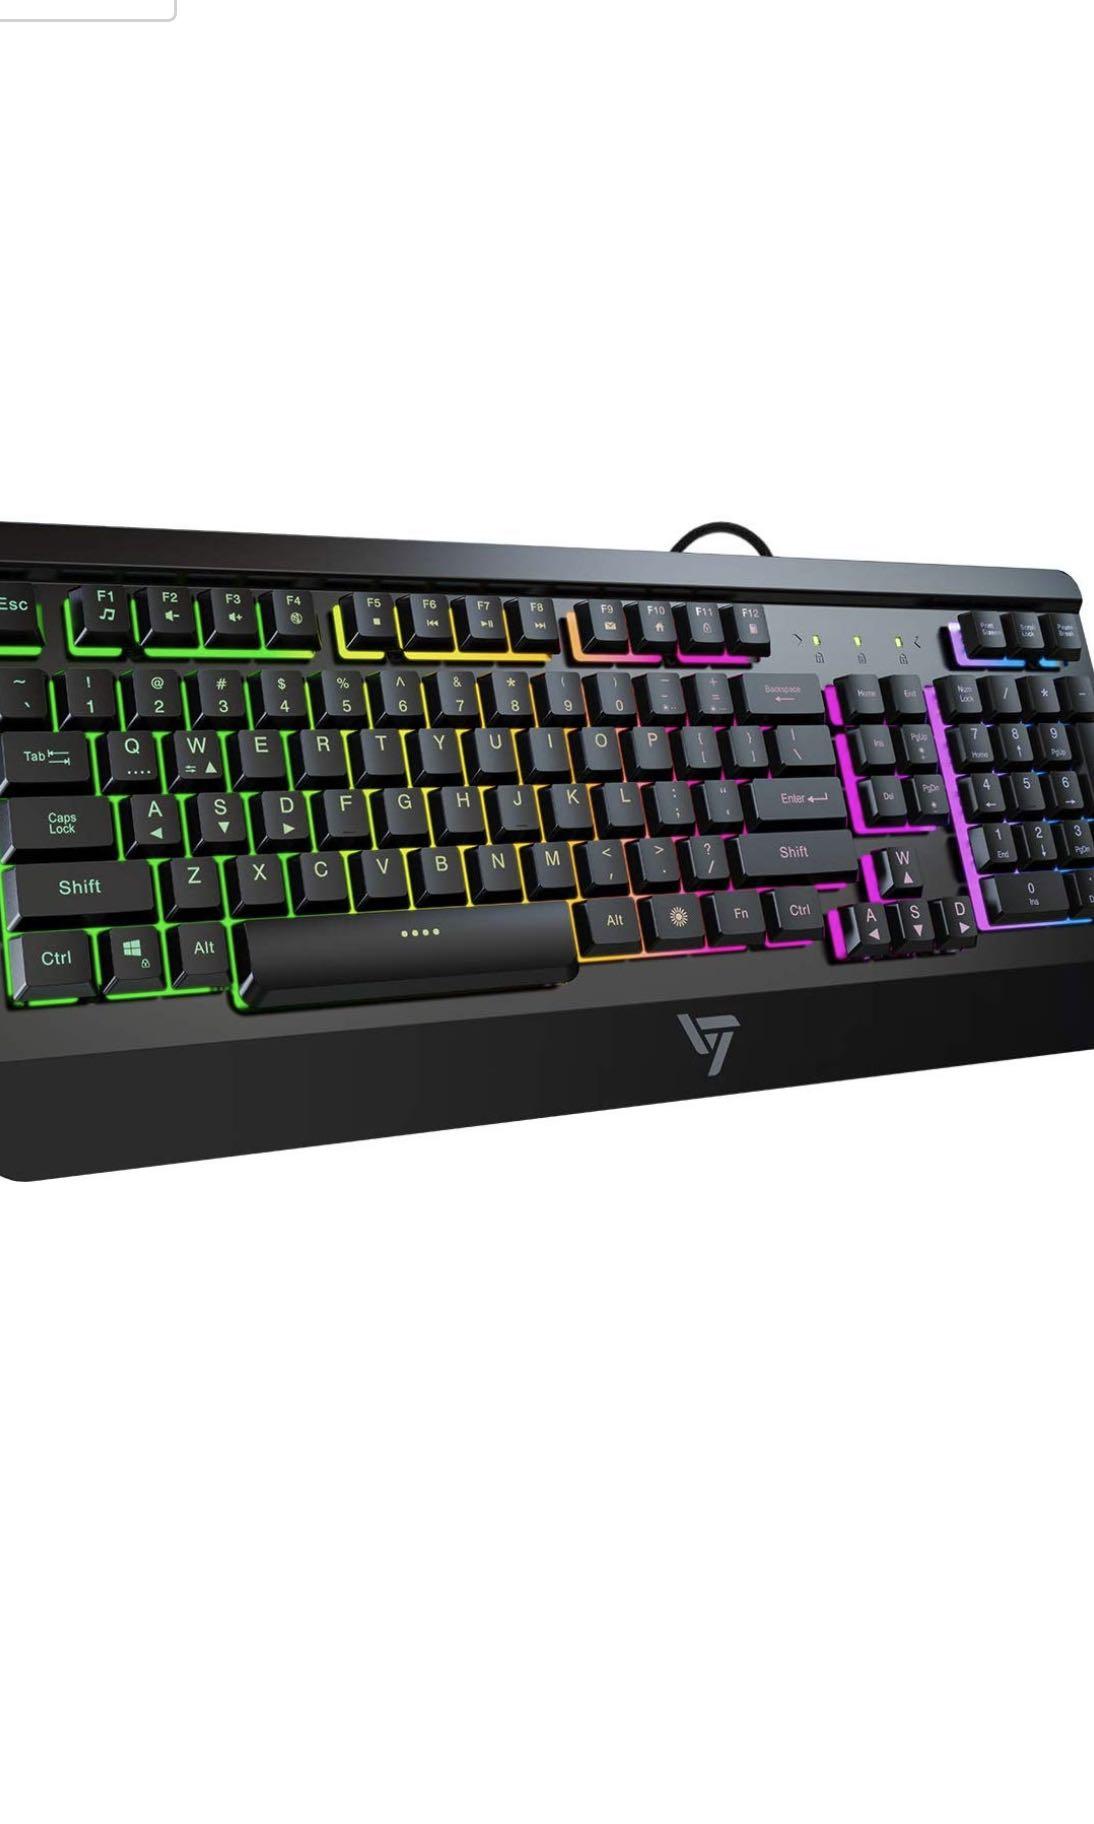 Quiet All-Metal Panel Keyboard Gaming Keyboard VicTsing USB Wired Keyboard